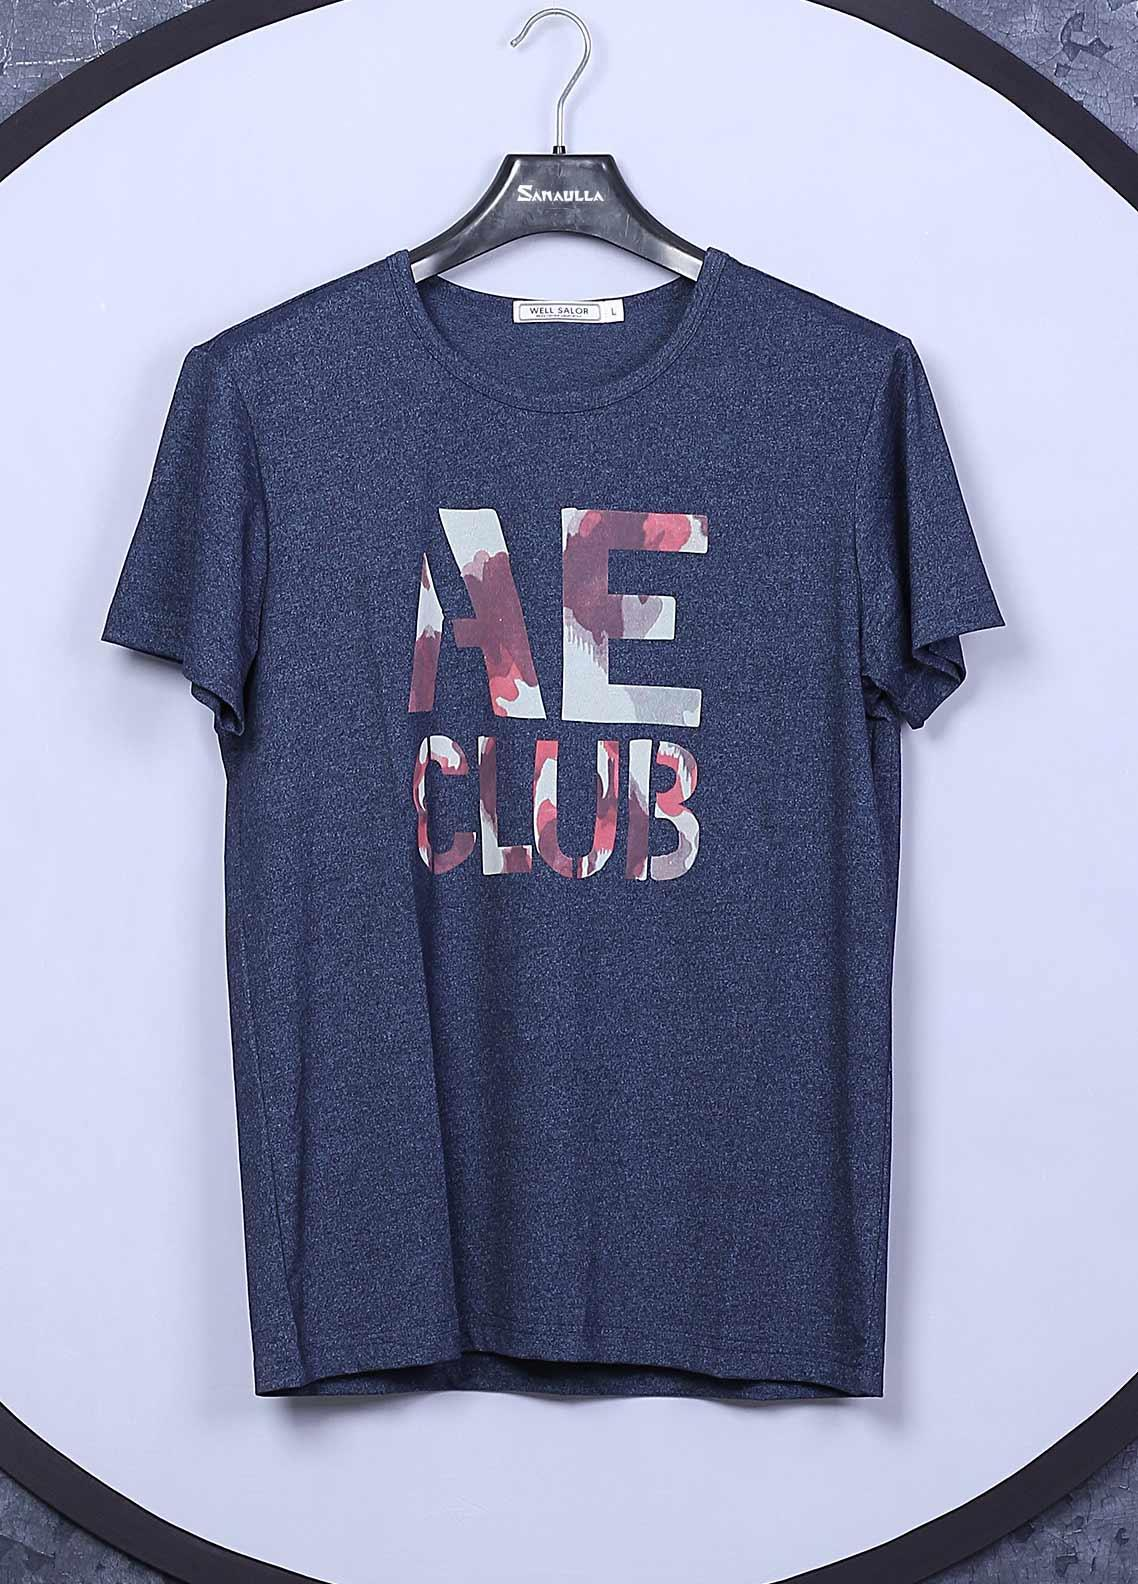 Sanaulla Exclusive Range Cotton Casual T-Shirts for Mens -  66822 Blue